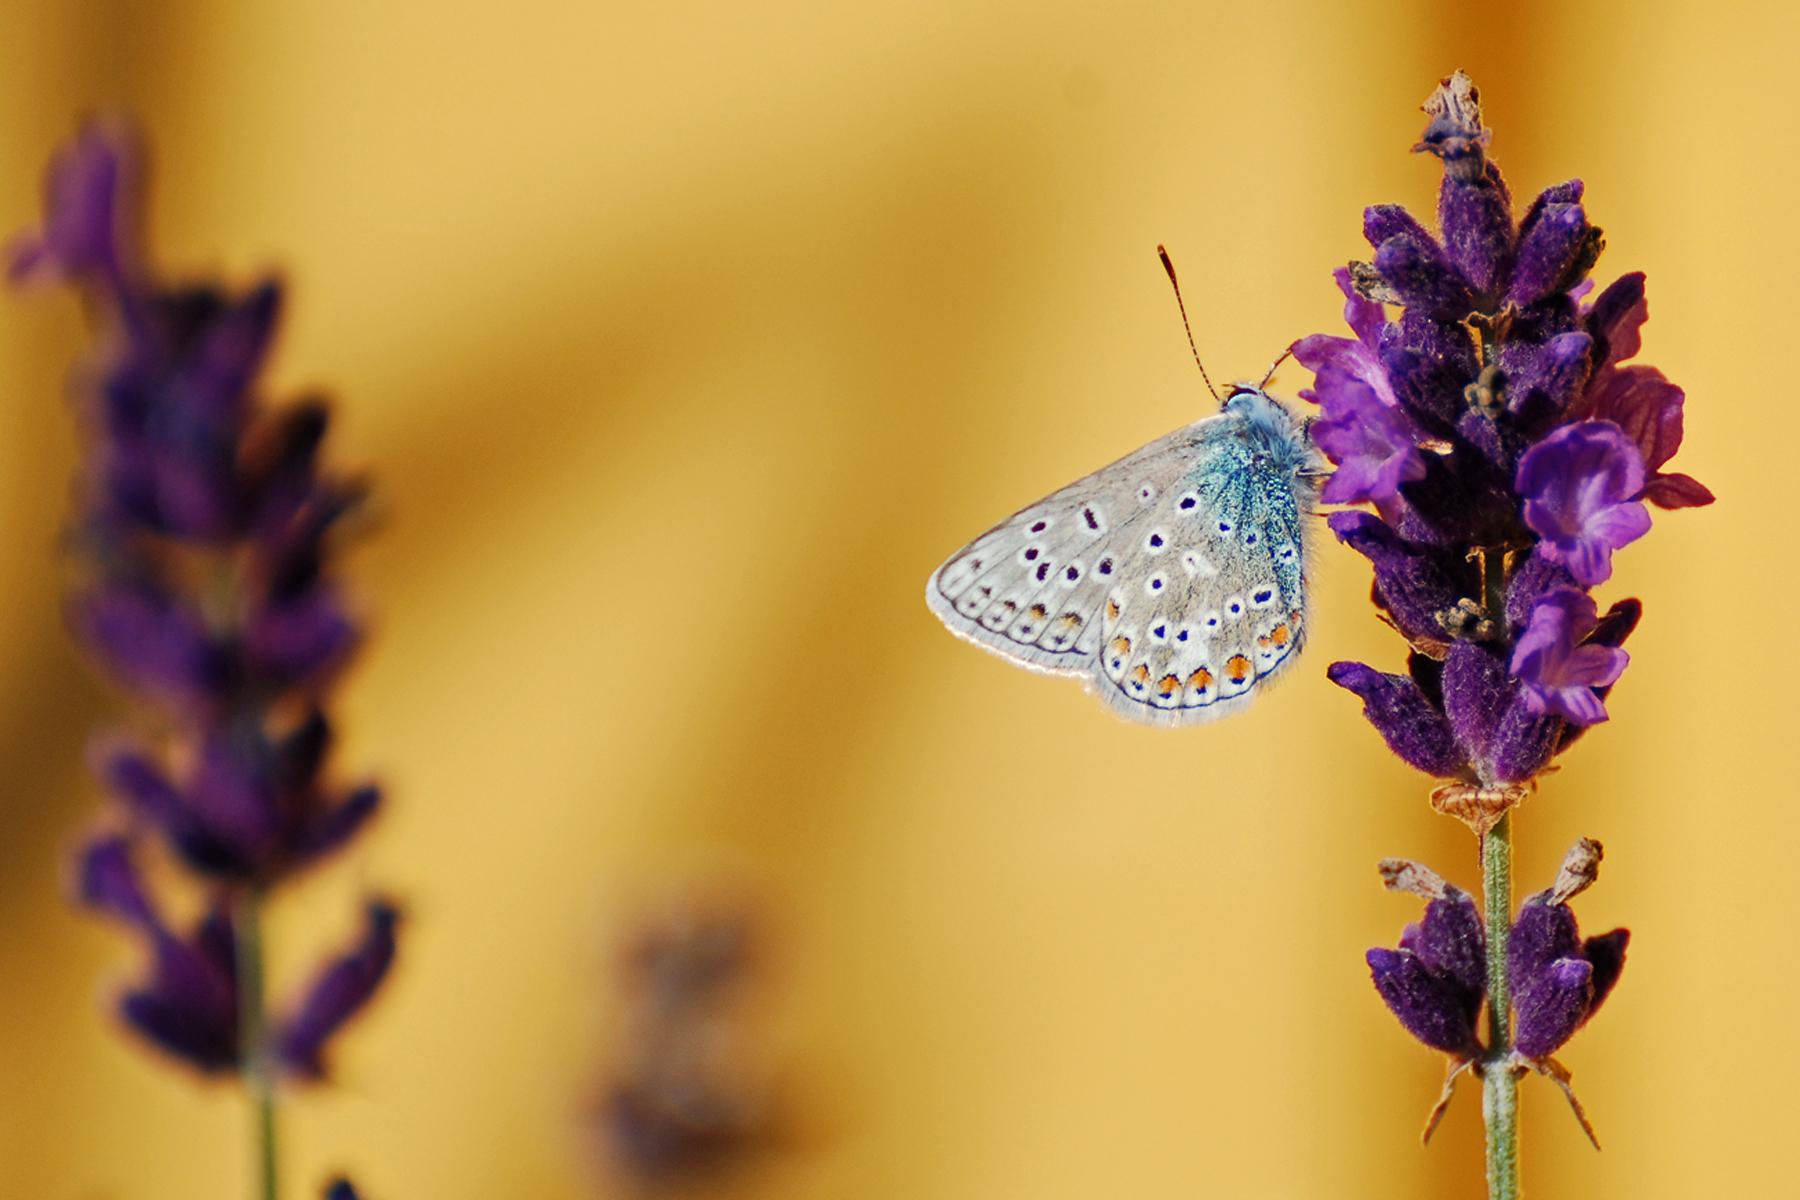 Silverblåvinge på en Lavendelblomma 2008